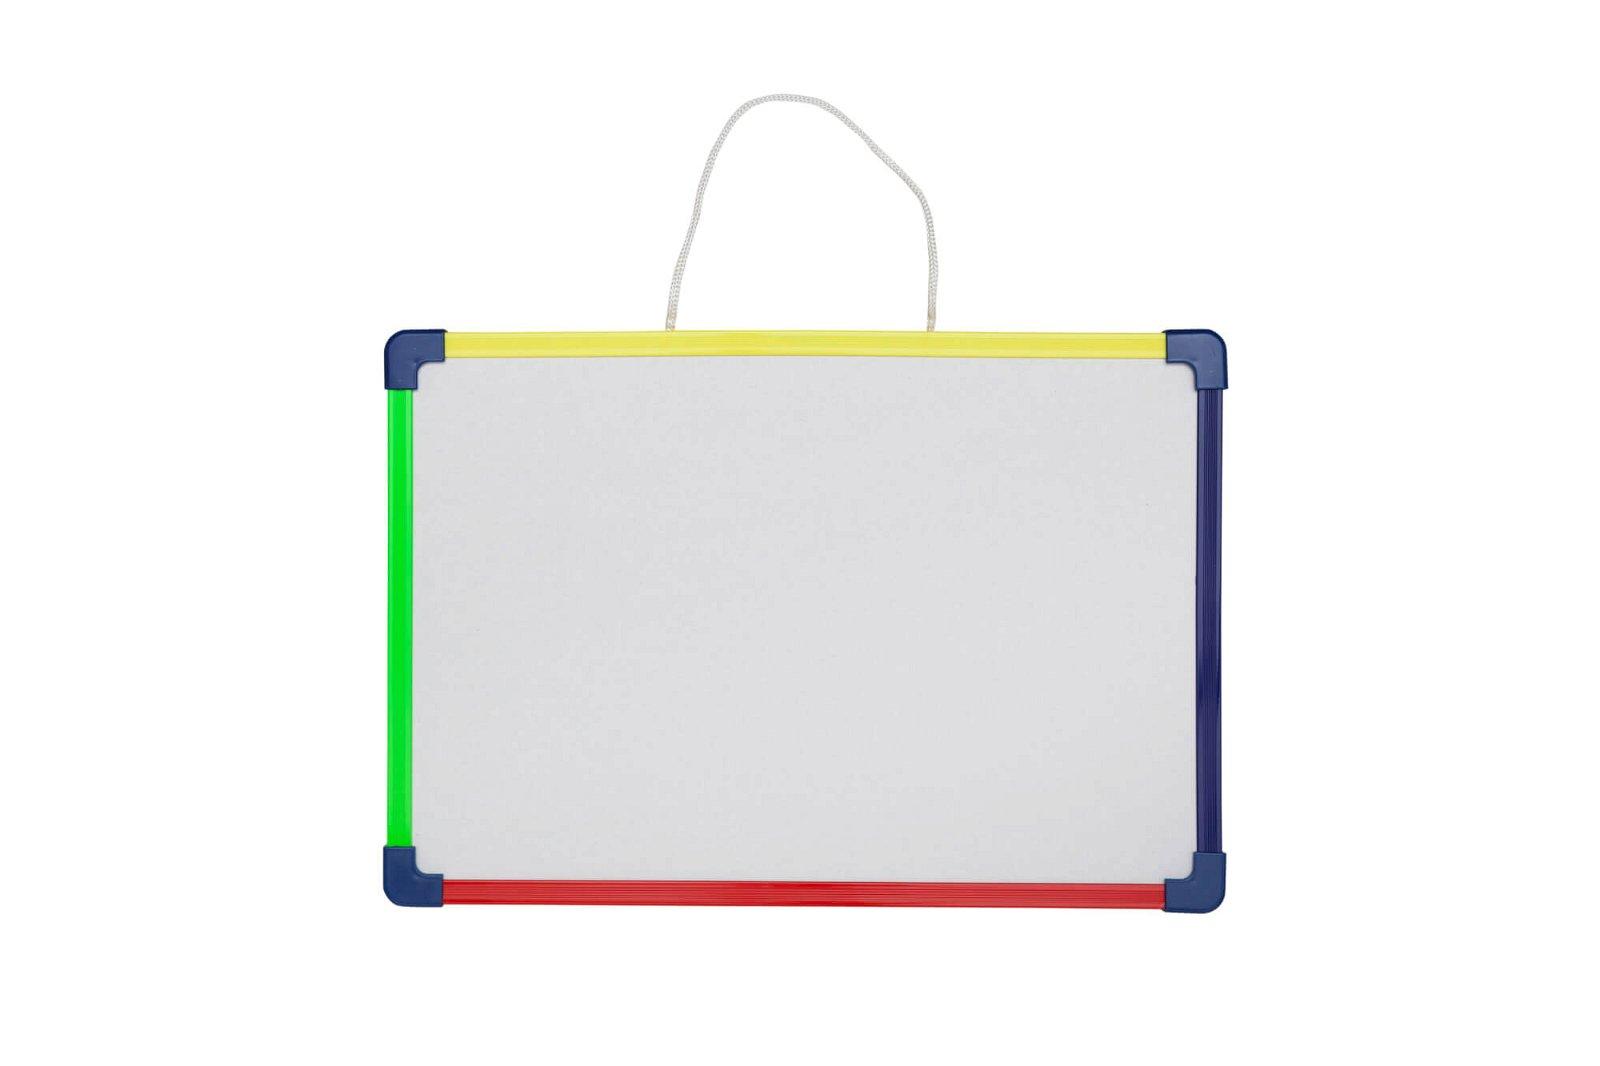 Kinder-Whiteboard, 24x35 cm,  SB-Verpackung, farbig sortiert